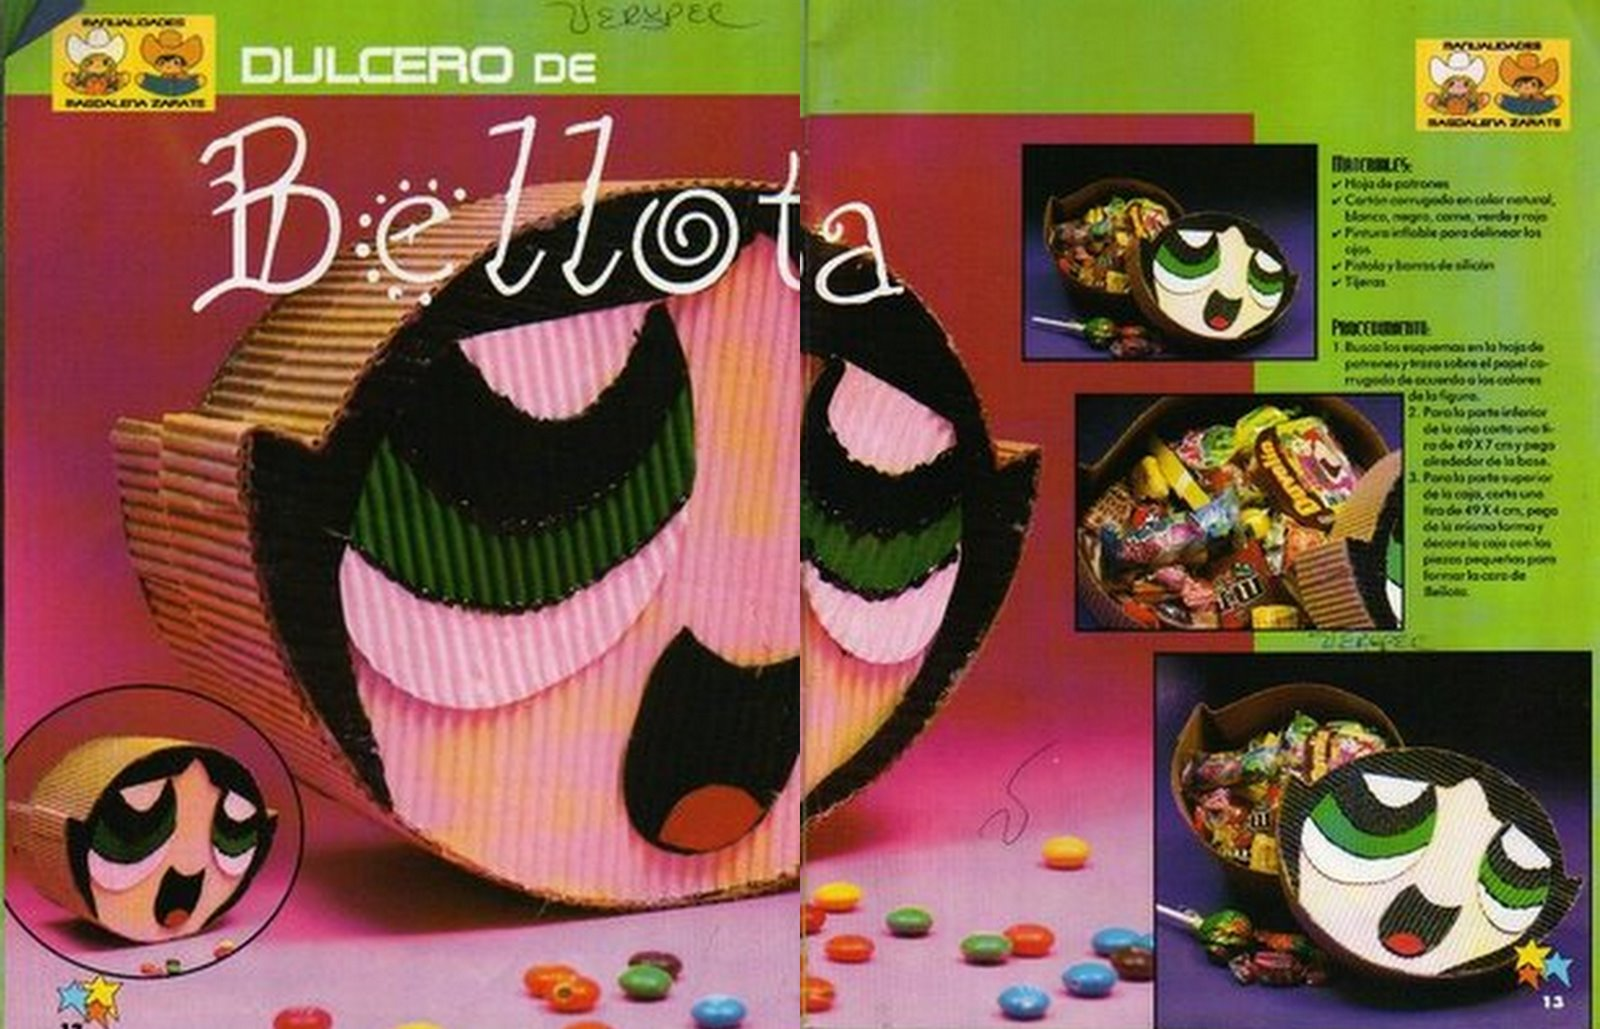 Dulcero de Bellota *